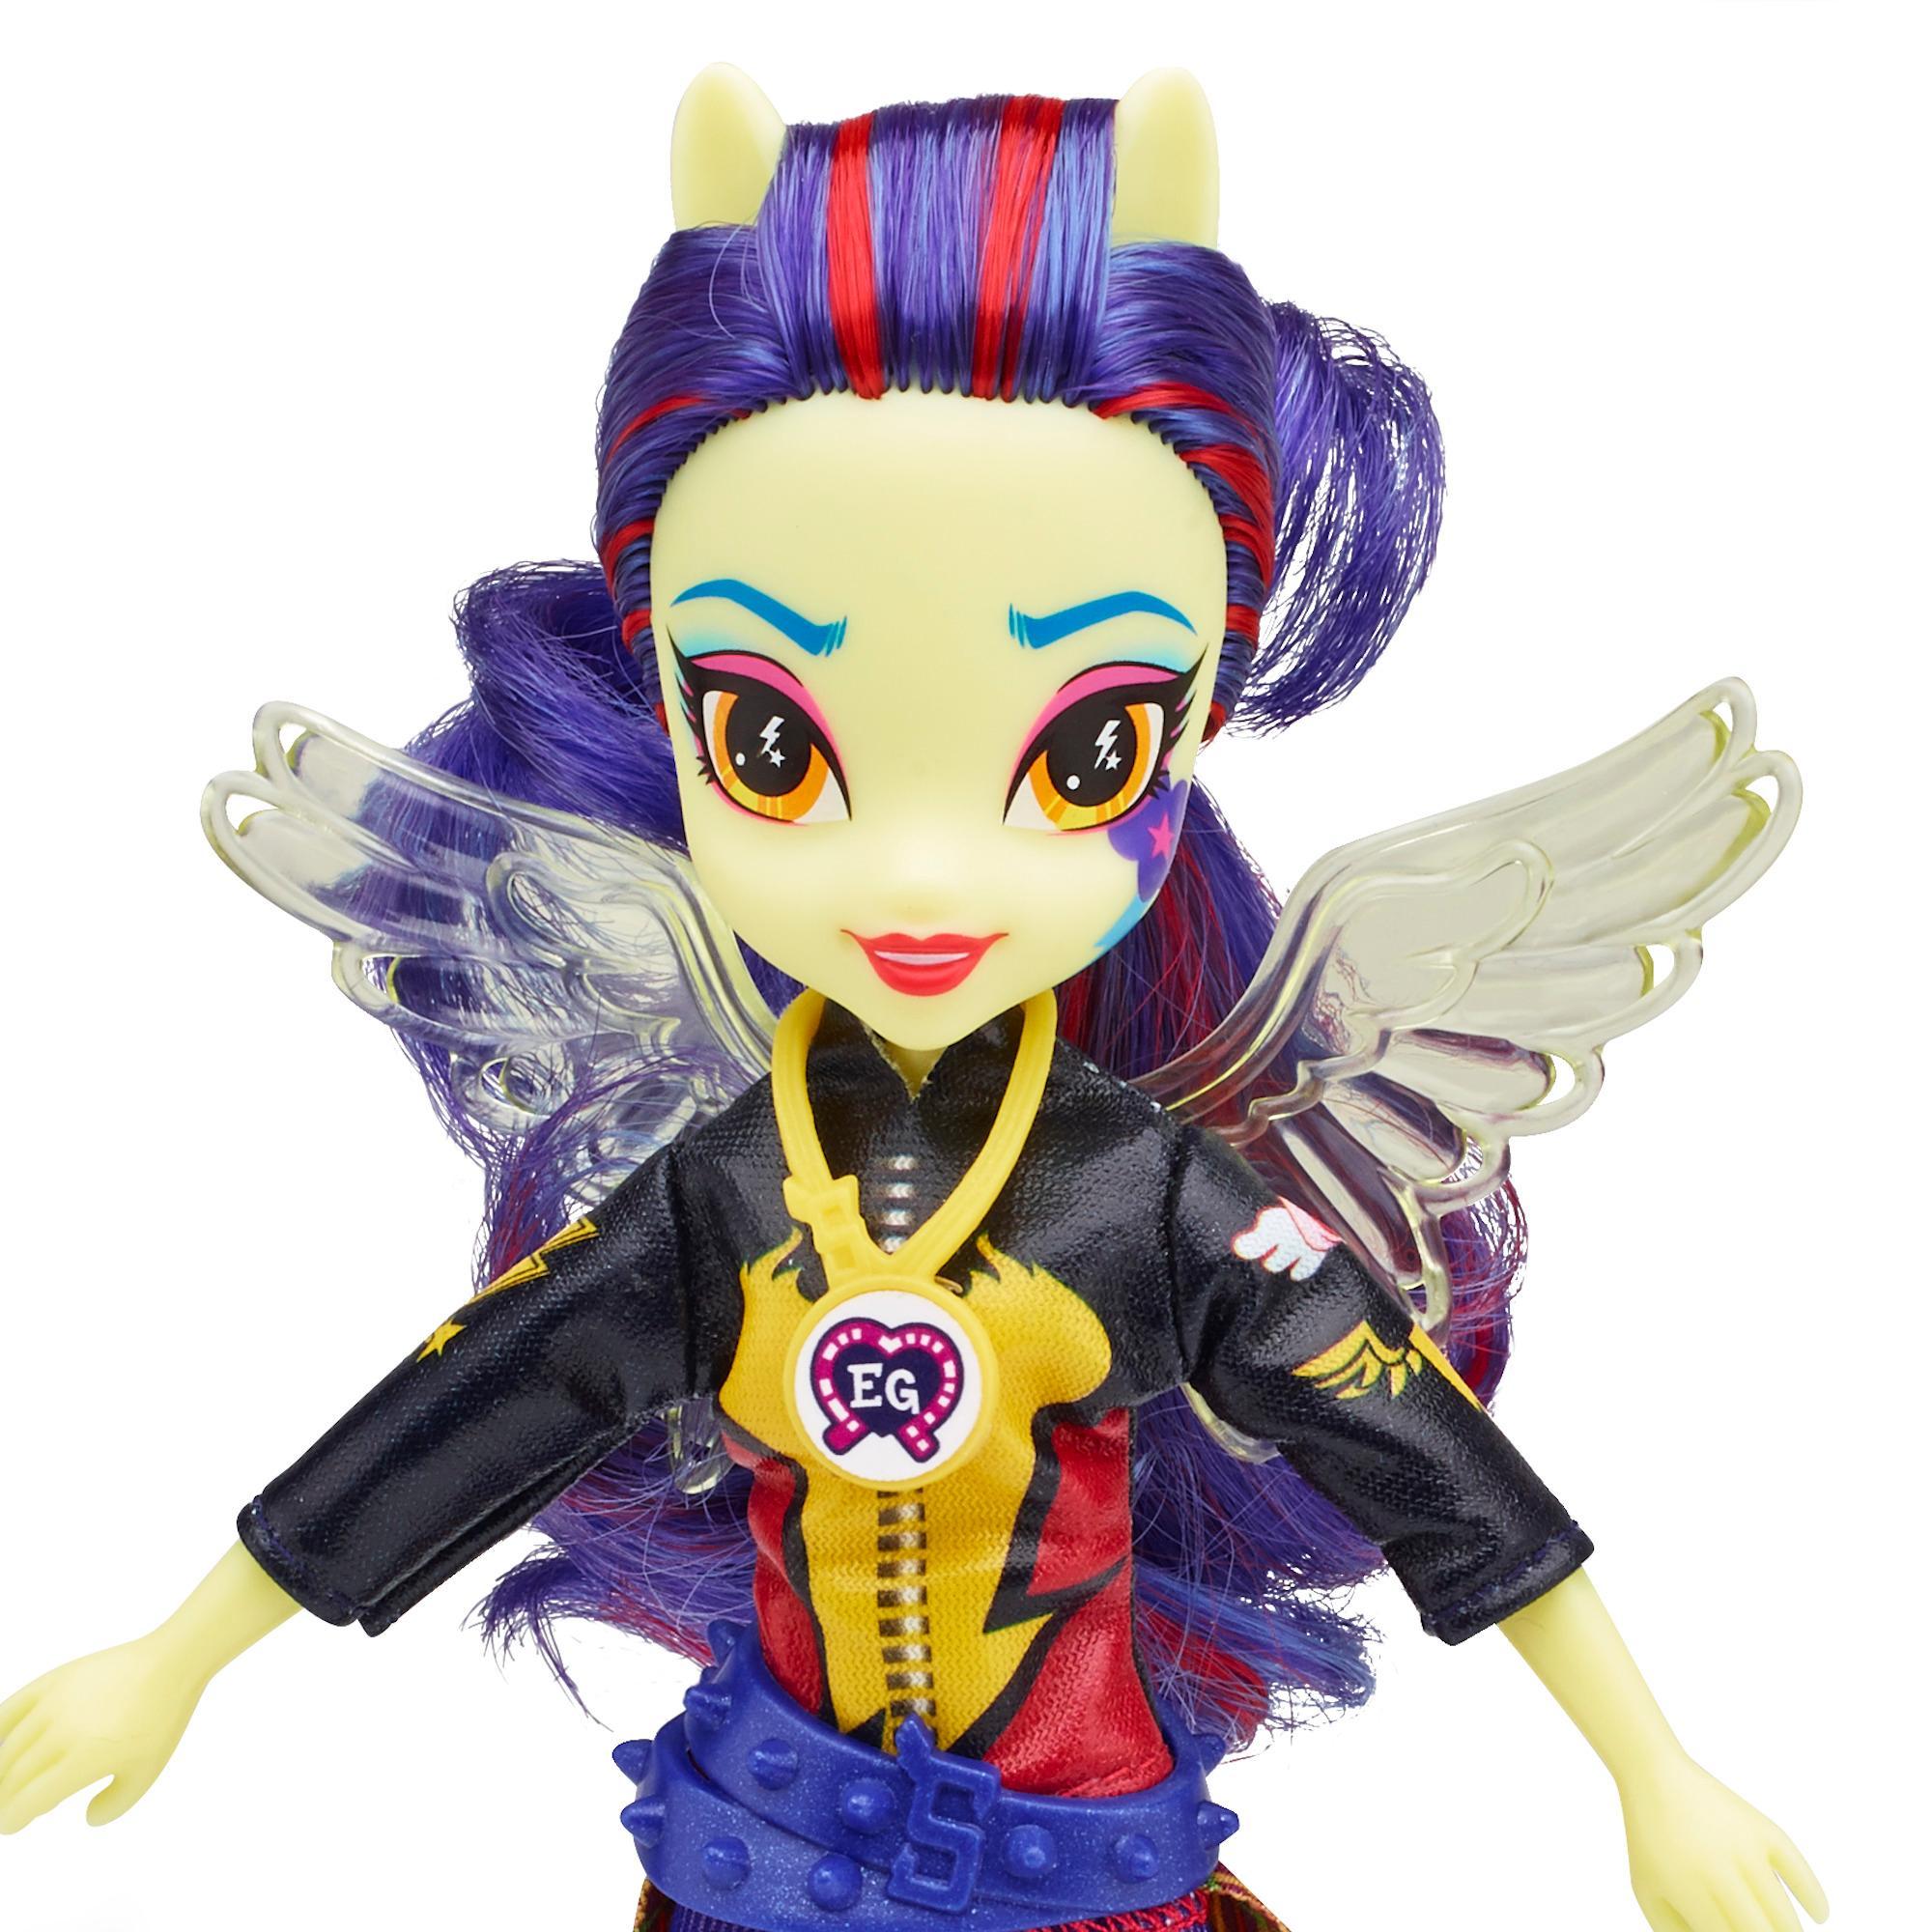 Indigo Zap Friendship Equestria Girls Doll Games